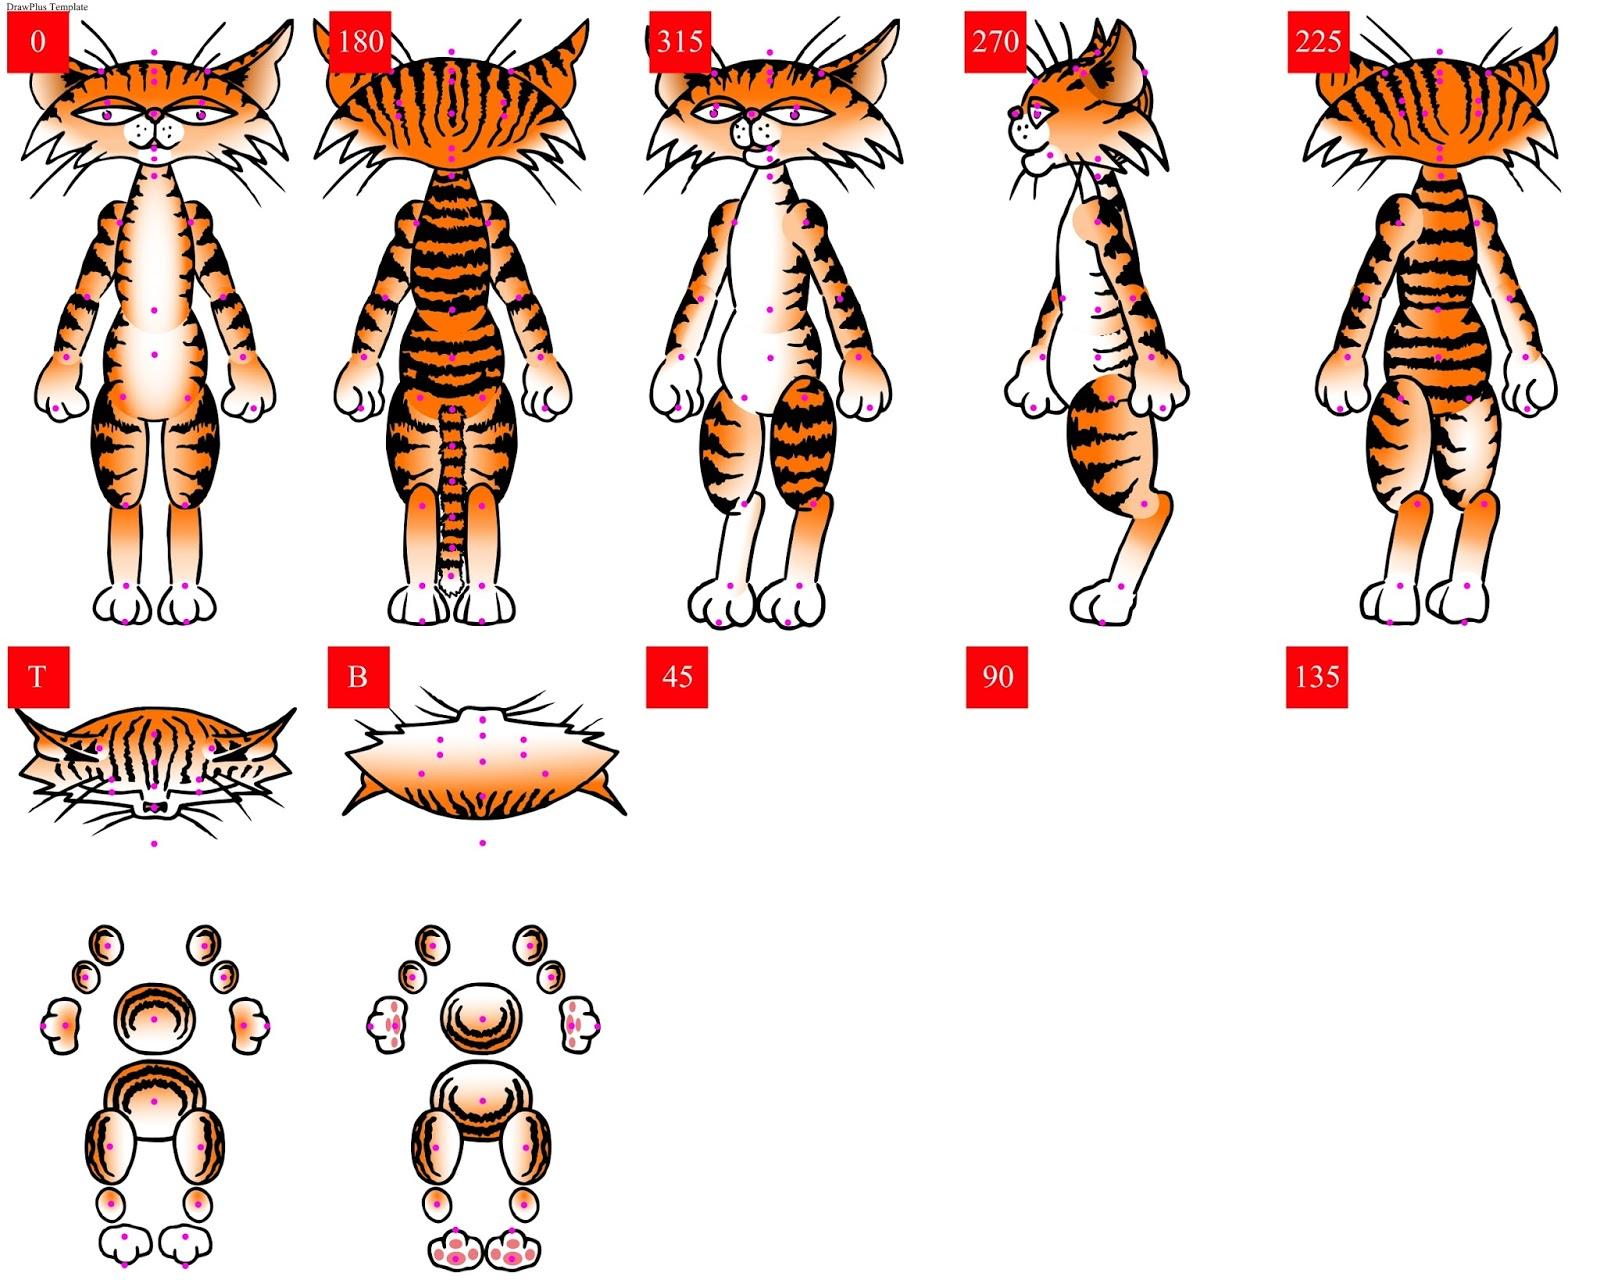 Crazytalk animator character pack - goblins